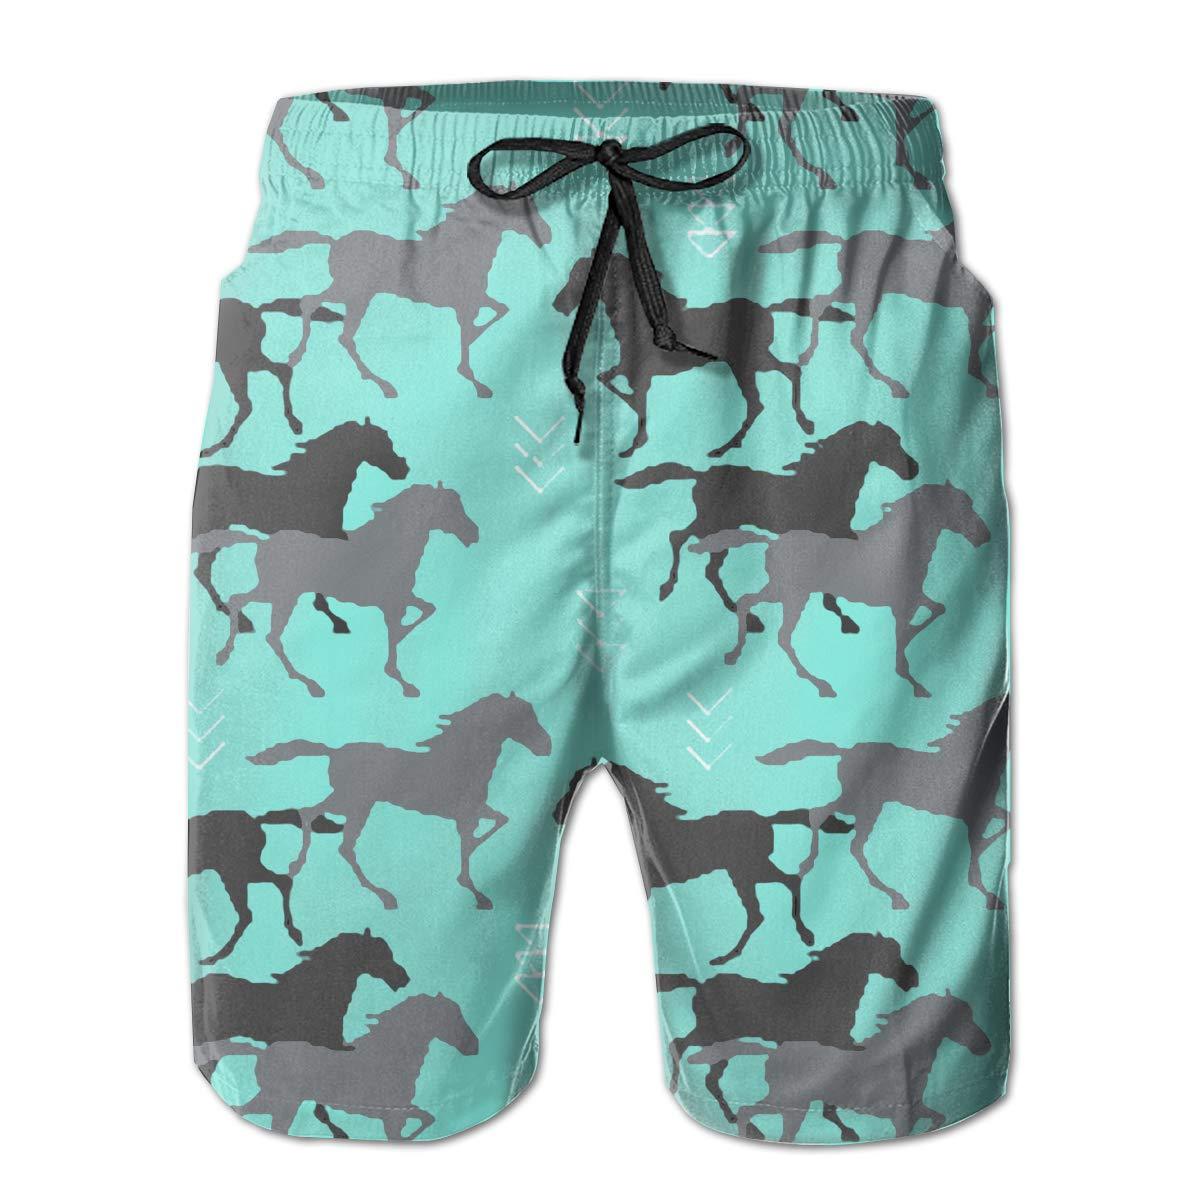 ZORITO Mens Swim Trunks Quick Dry Summer Holiday Beach Shorts with Mesh Lining Merry Christmas Beachwear